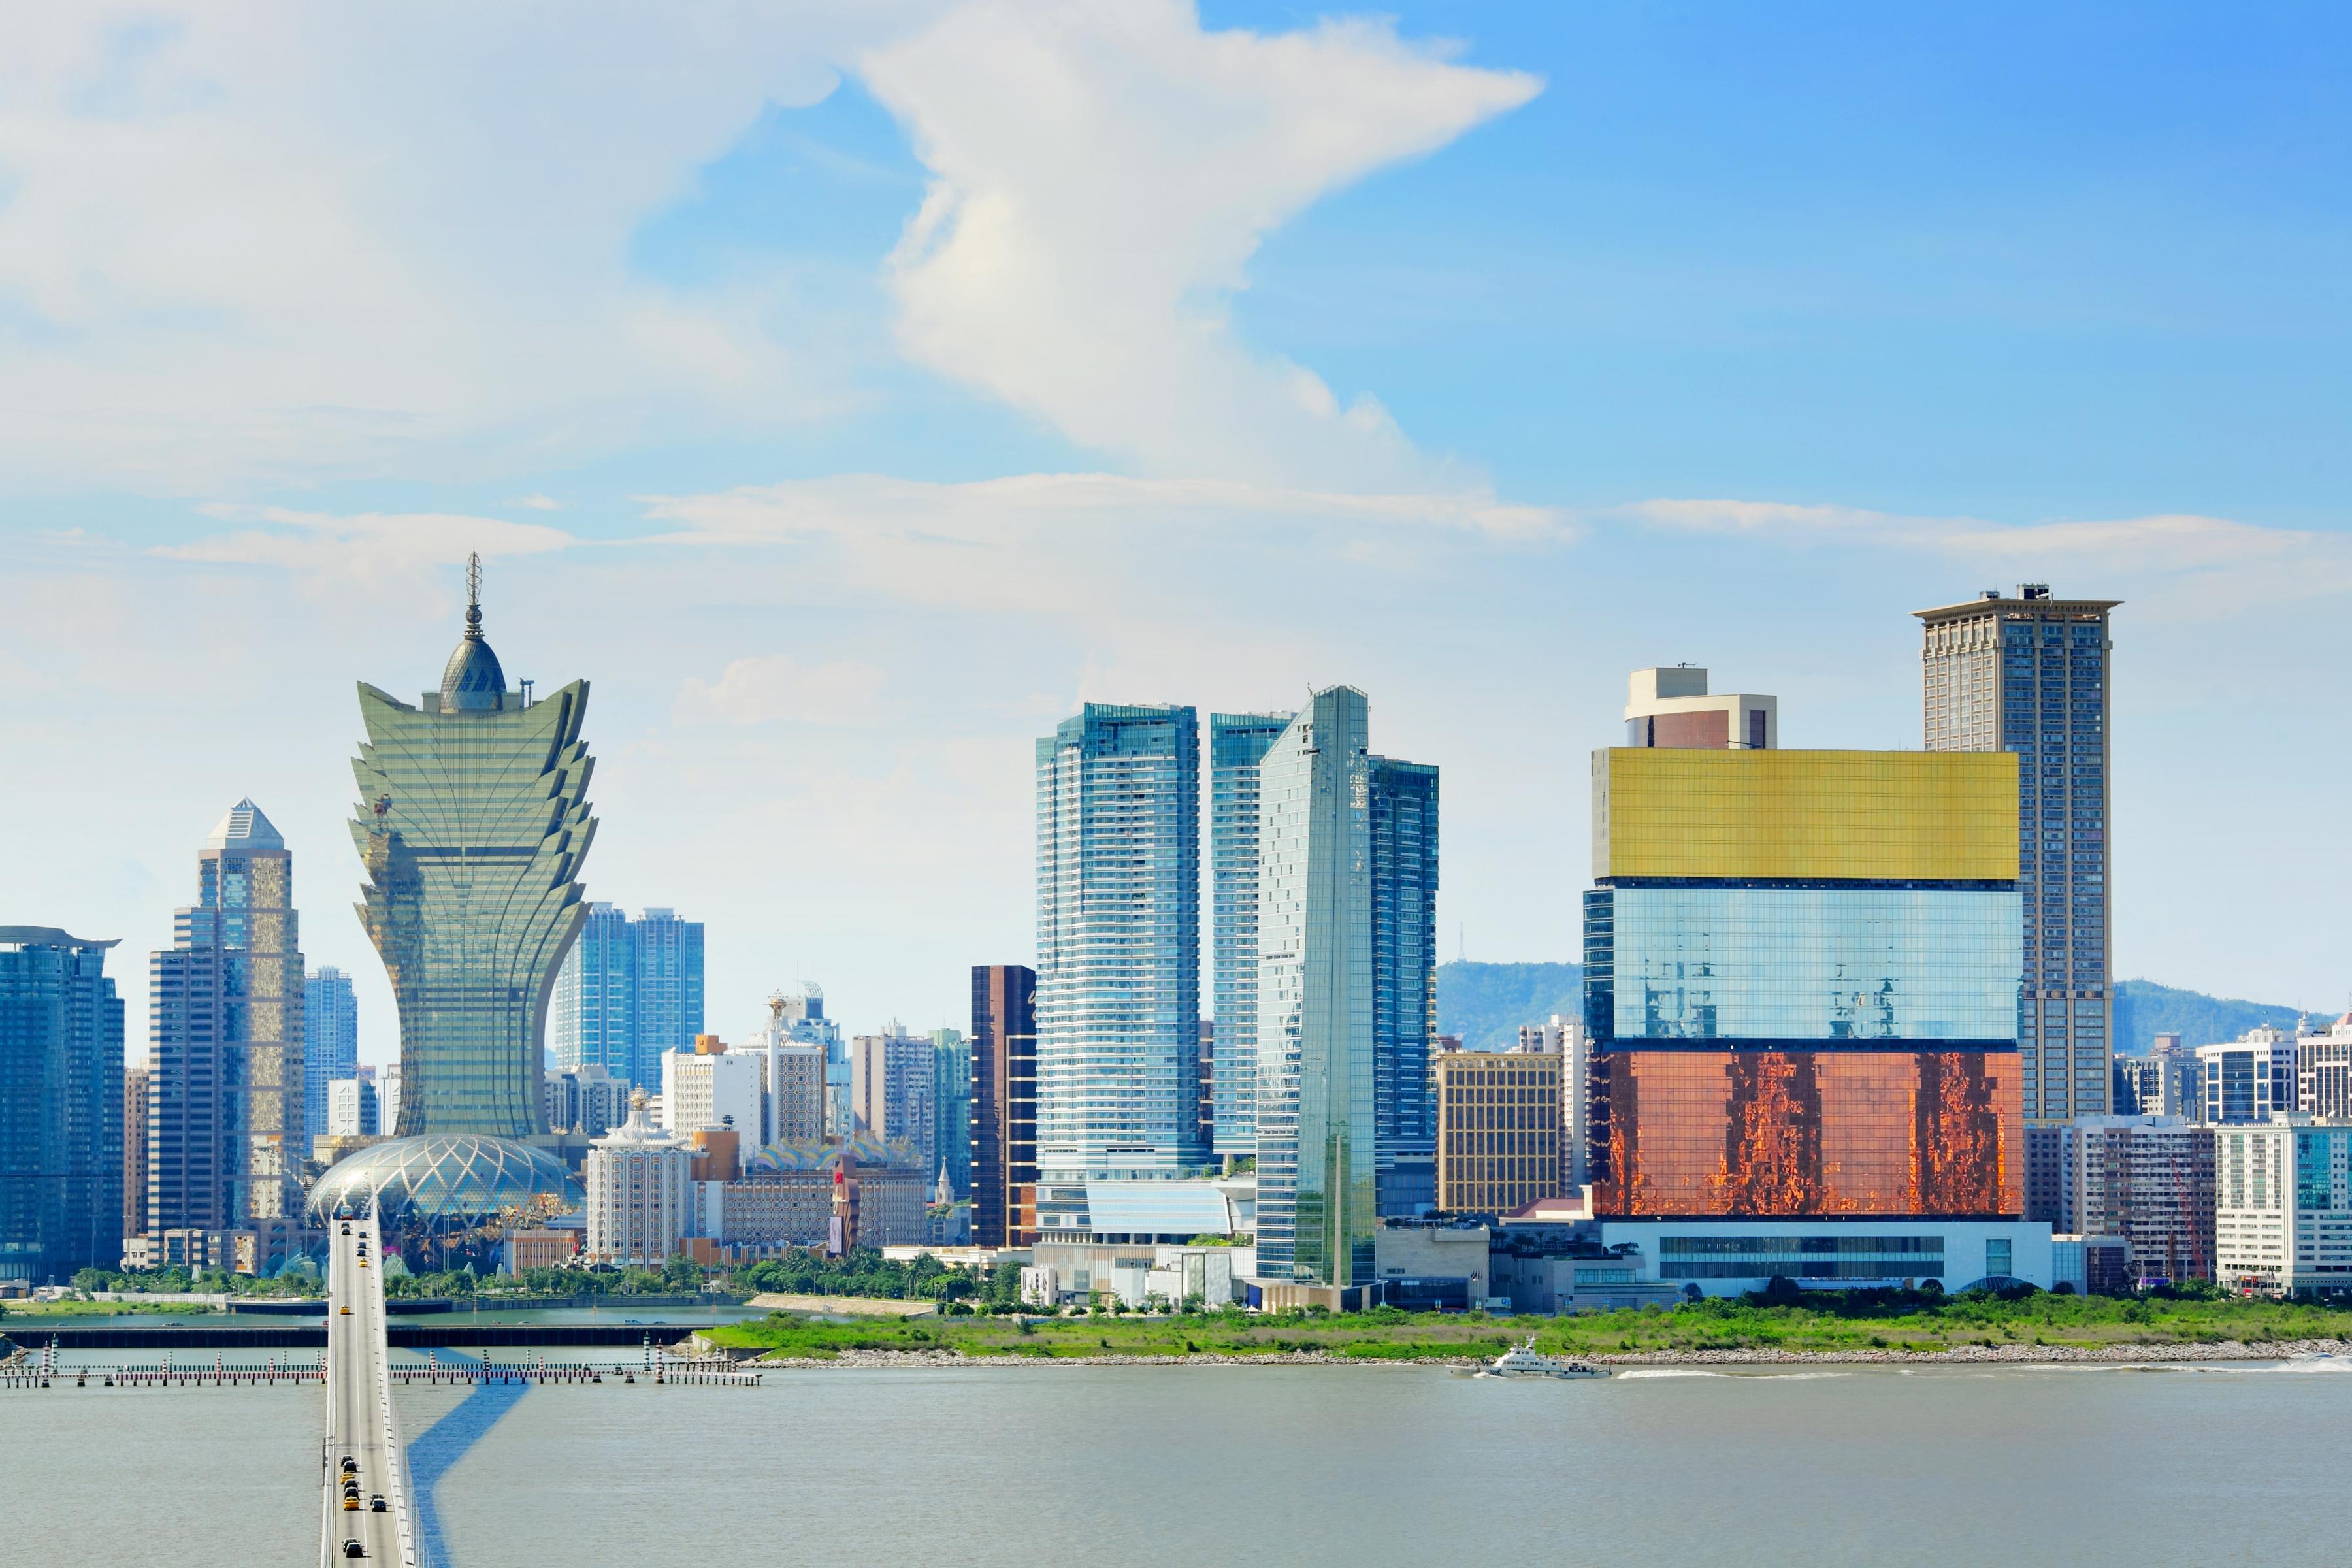 Macau's skyline during the day.